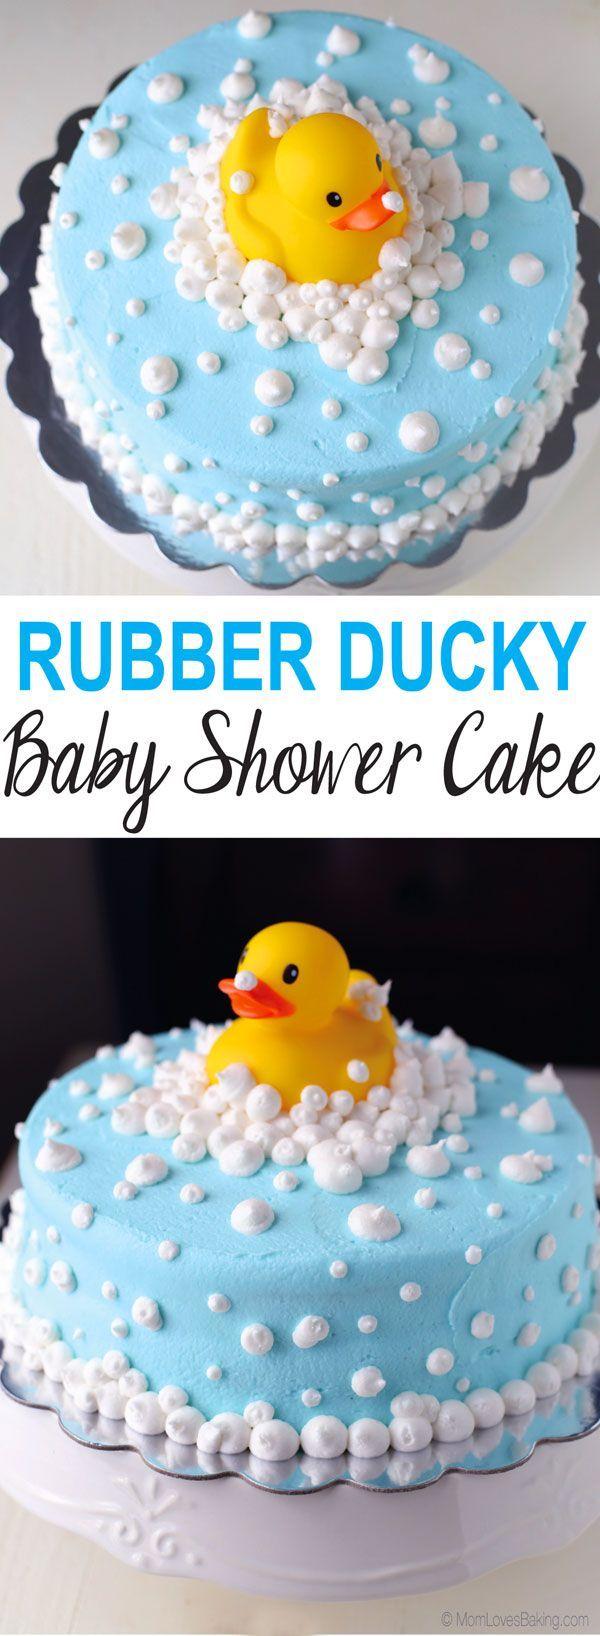 Rubber Ducky Baby Shower Cake 74 best